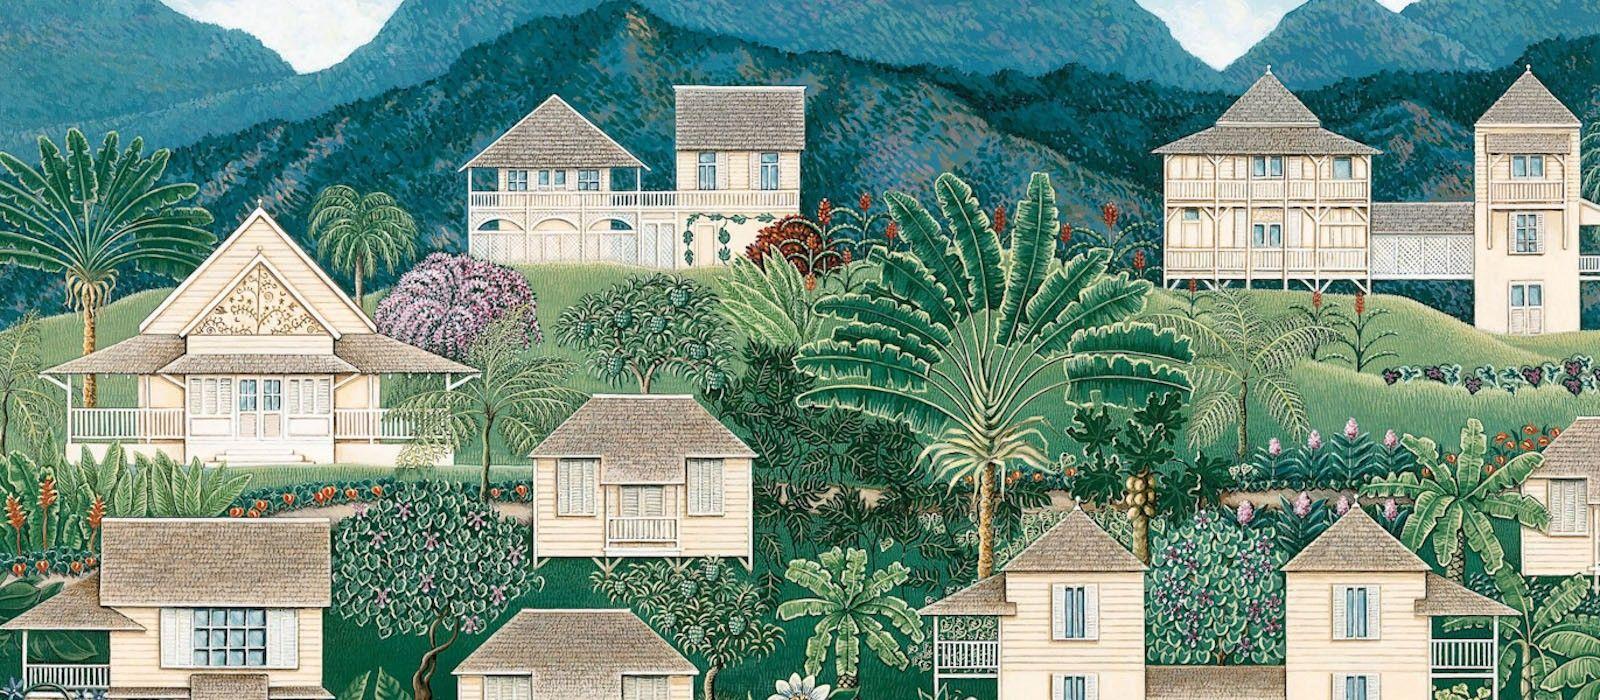 Pin by Olivia on Illustrate Jamaica luxury resorts